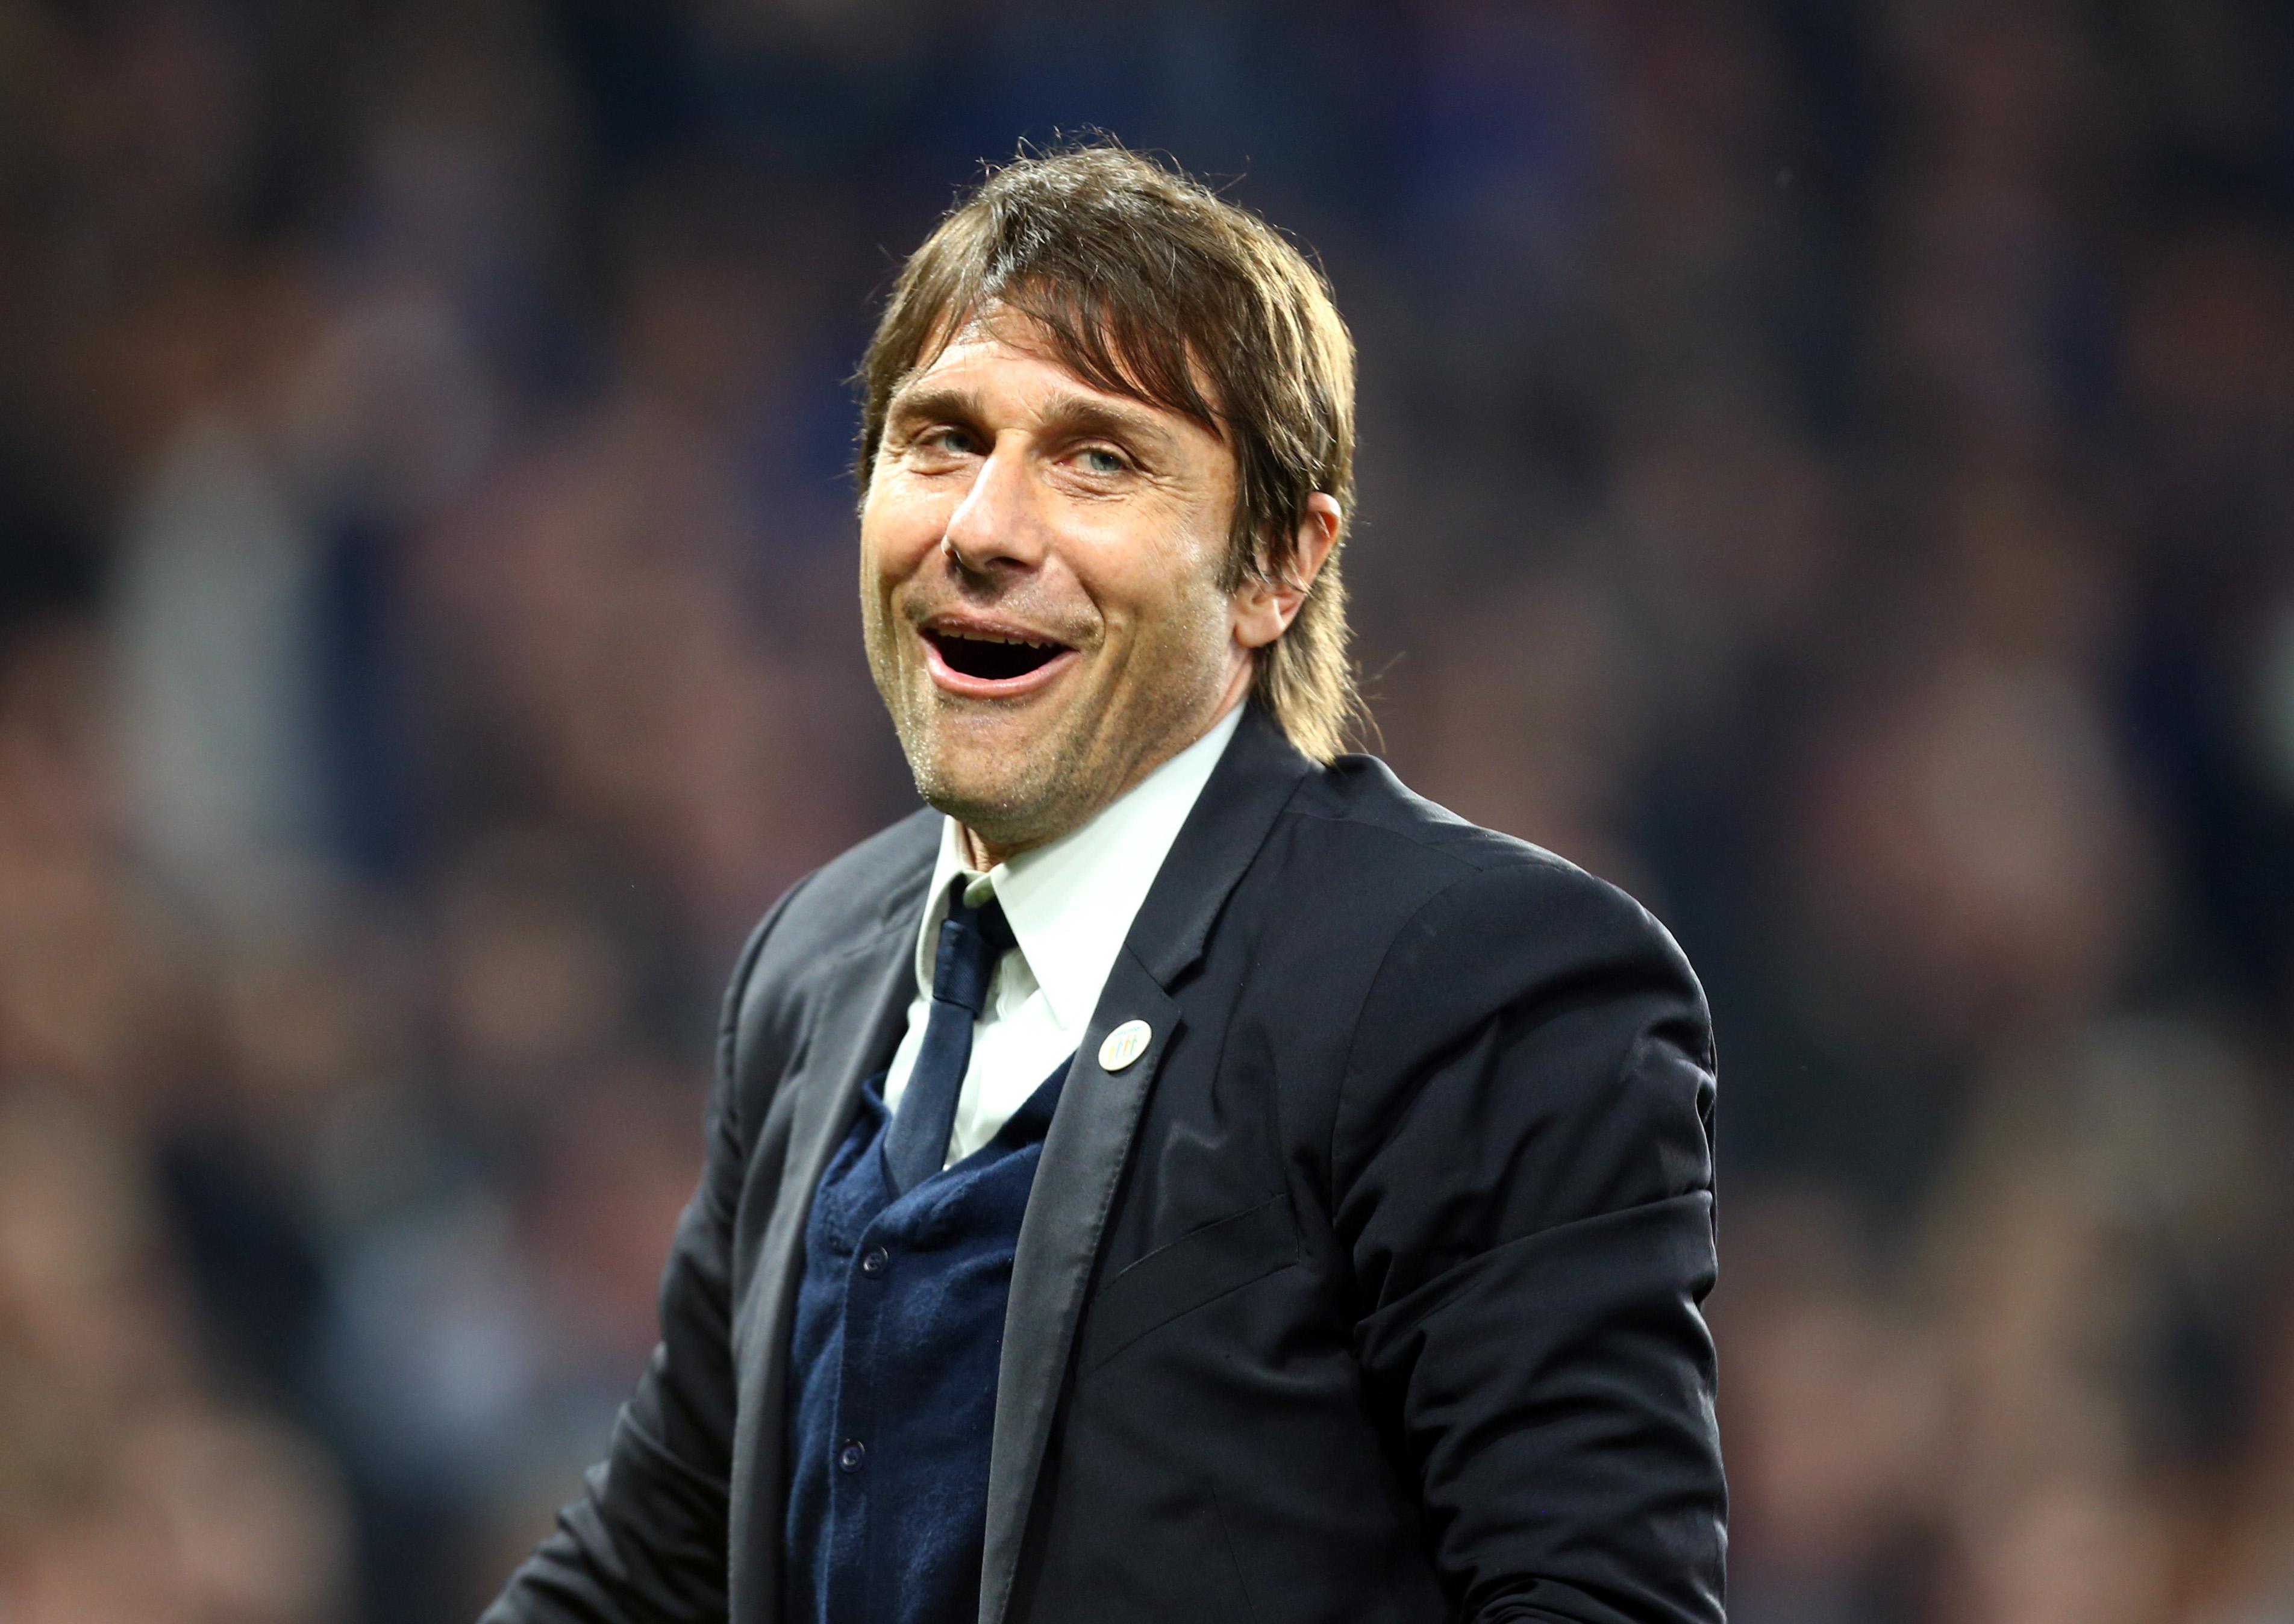 Joe Cole urges Antonio Conte to adopt Sir Alex Ferguson's blueprint and sign Sergio Aguero and Alexis Sanchez